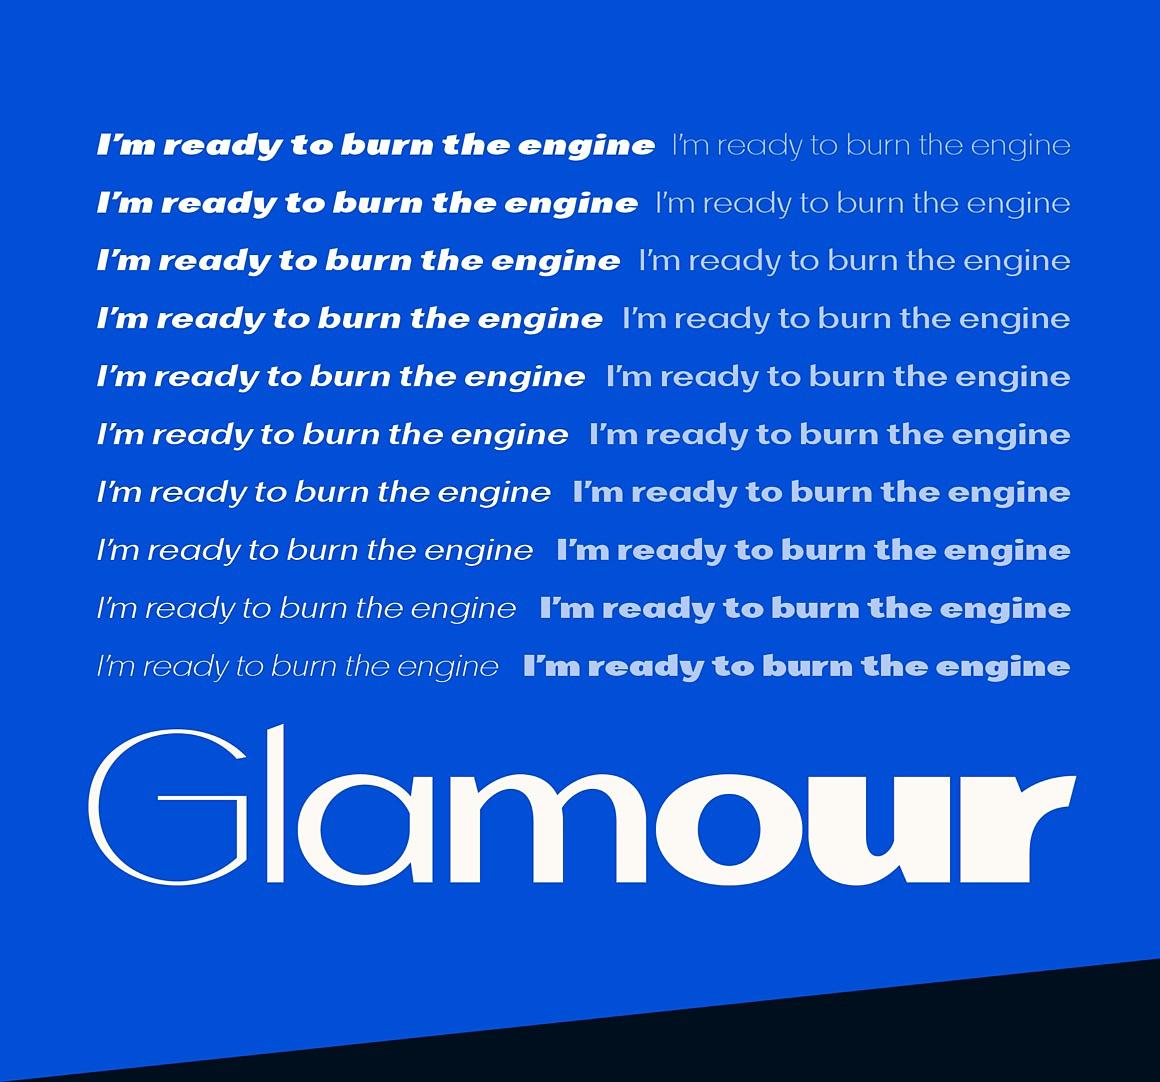 AlterGlam Elegant Extended Font images/promo_alterglam-font_expanded-3.jpg